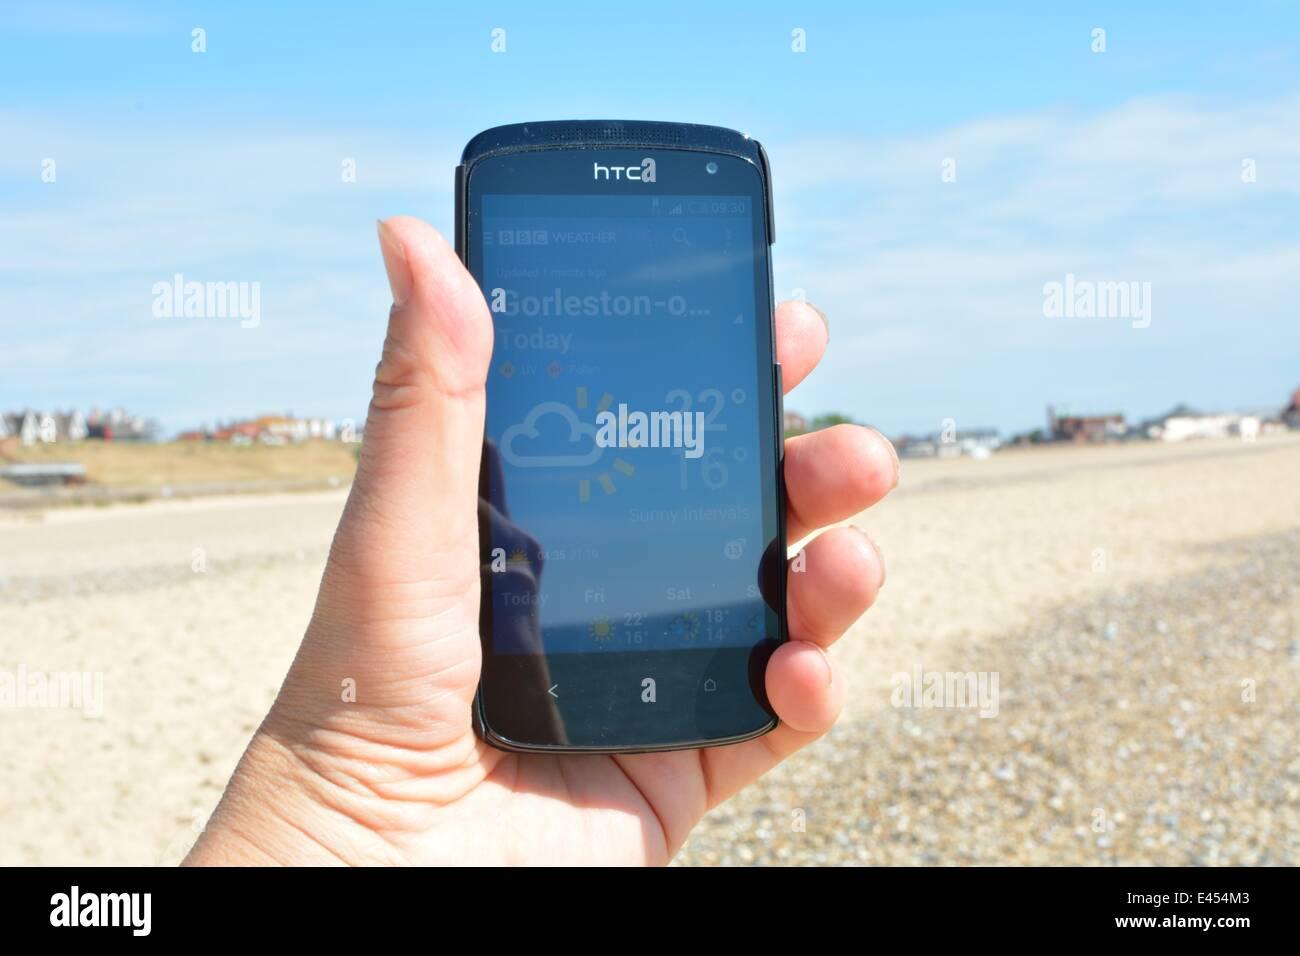 bbc weather app for samsung galaxy